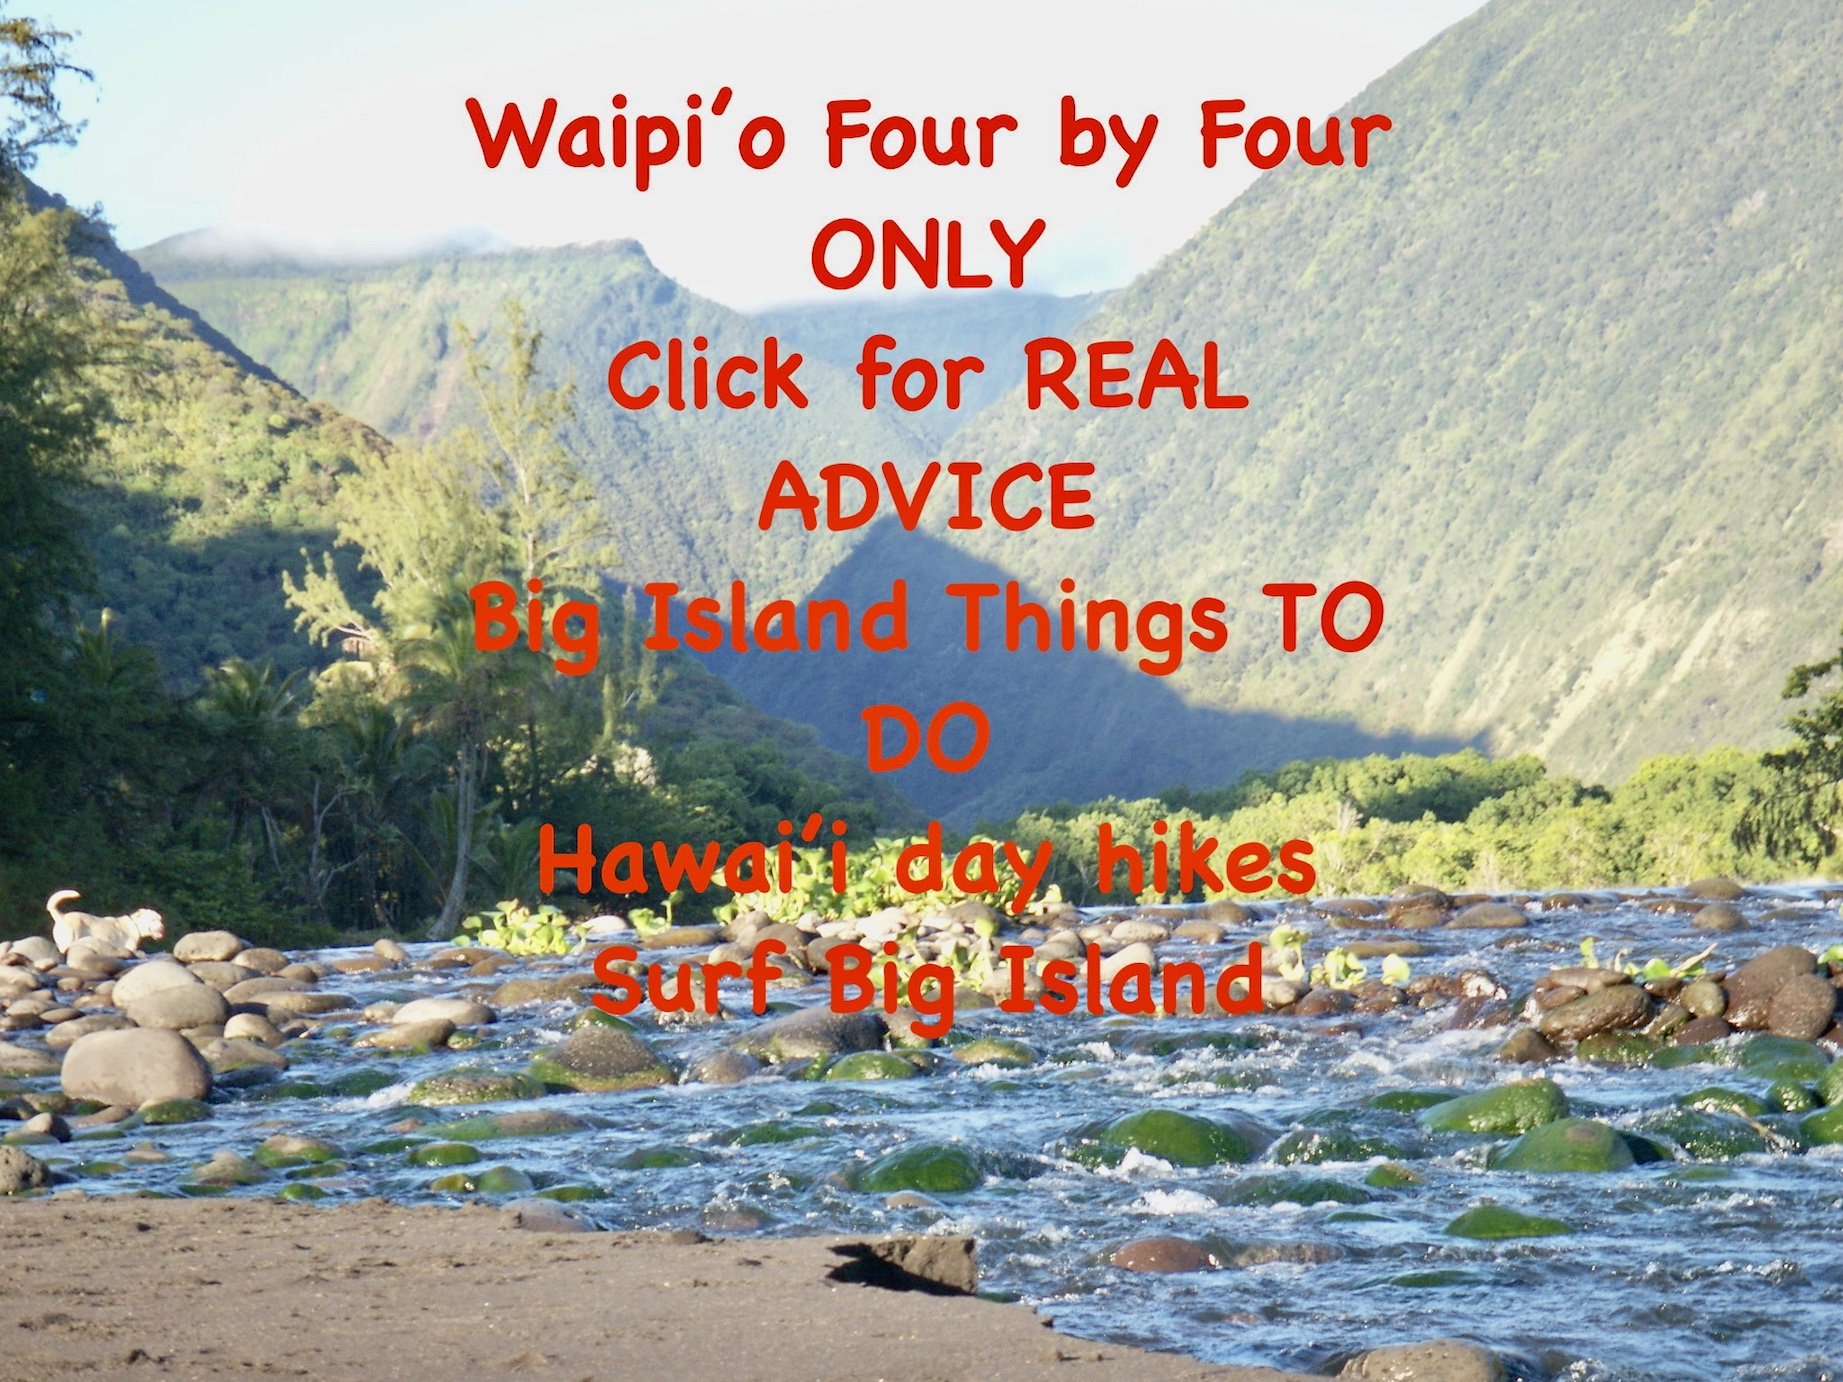 waipioblog